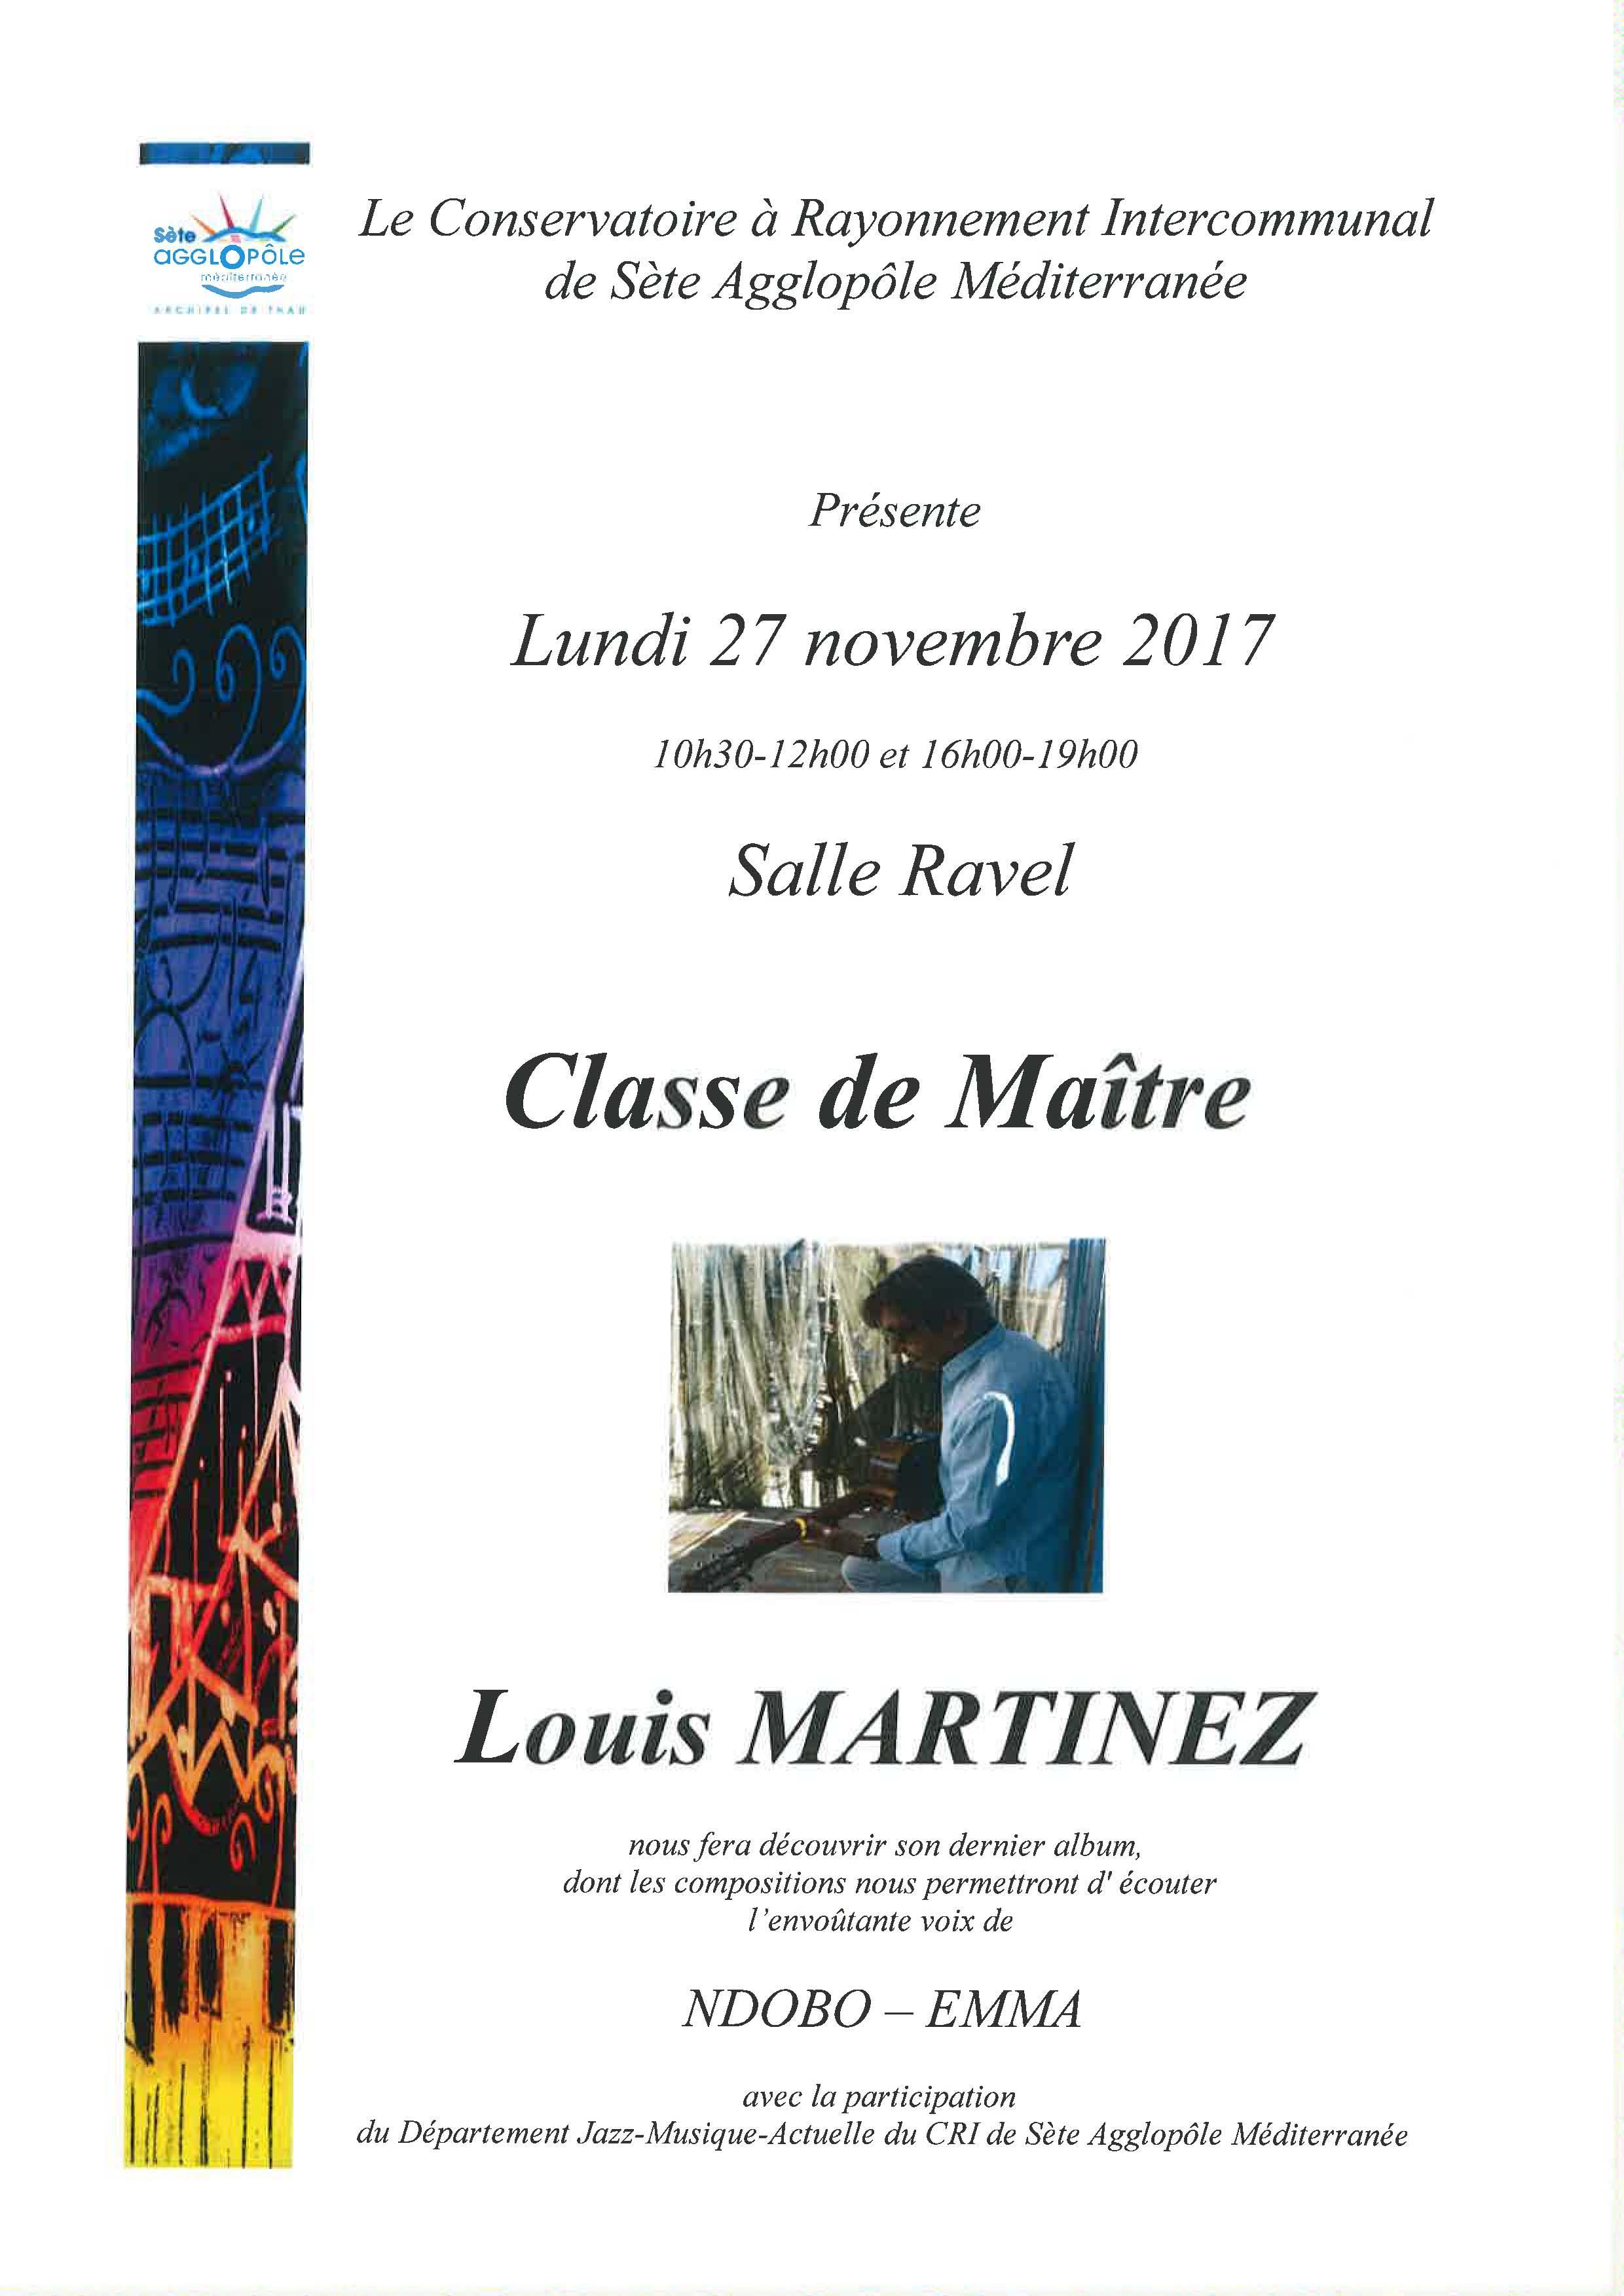 Lundi 27 novembre 2017 : classe de maître